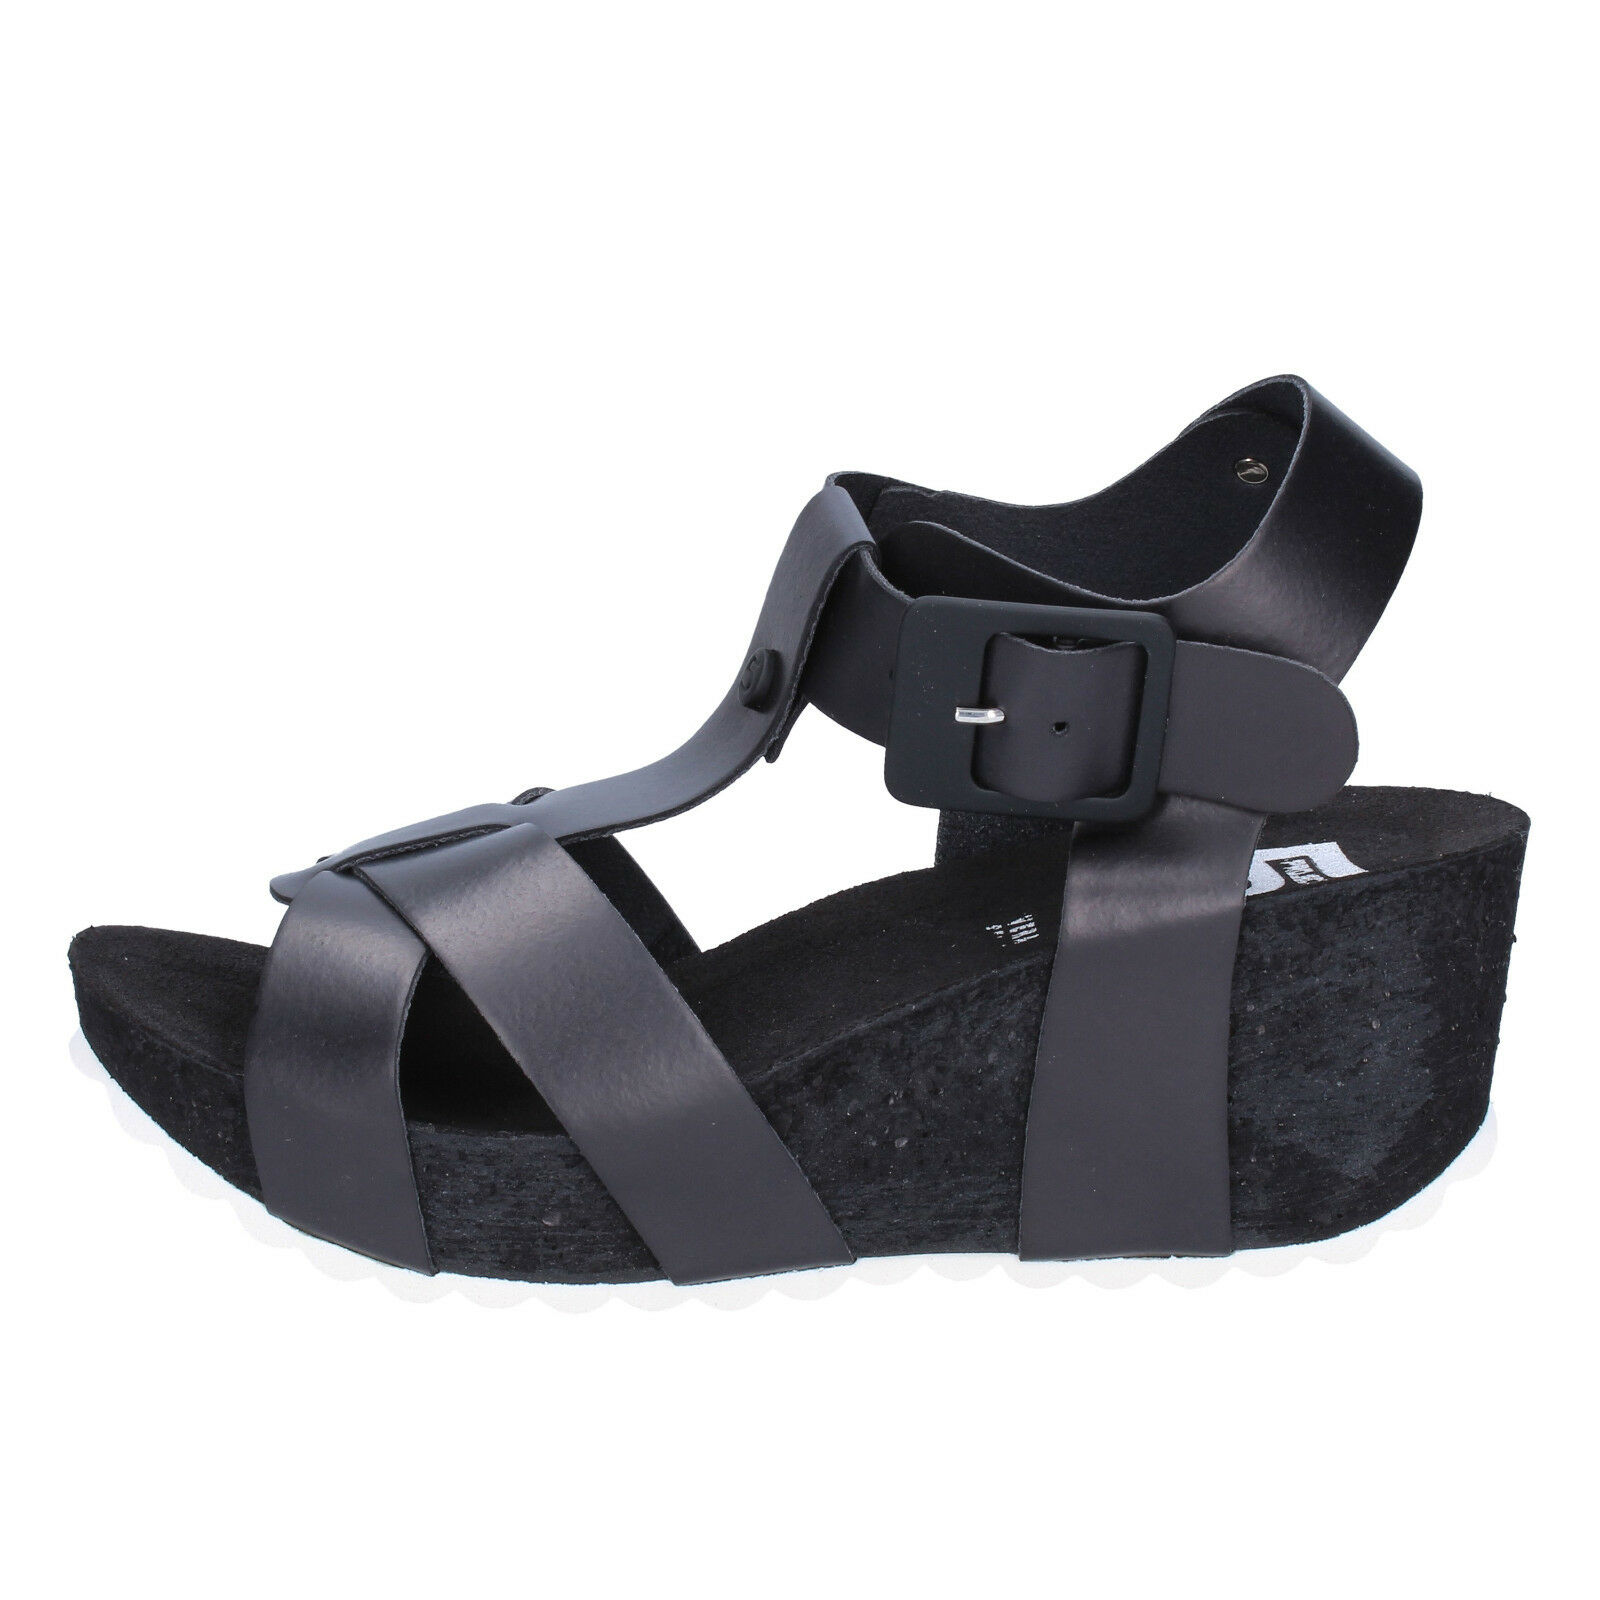 Scarpe donna sandali 5 PRO JECT 38 EU sandali donna nero pelle AC606-D d1fc49